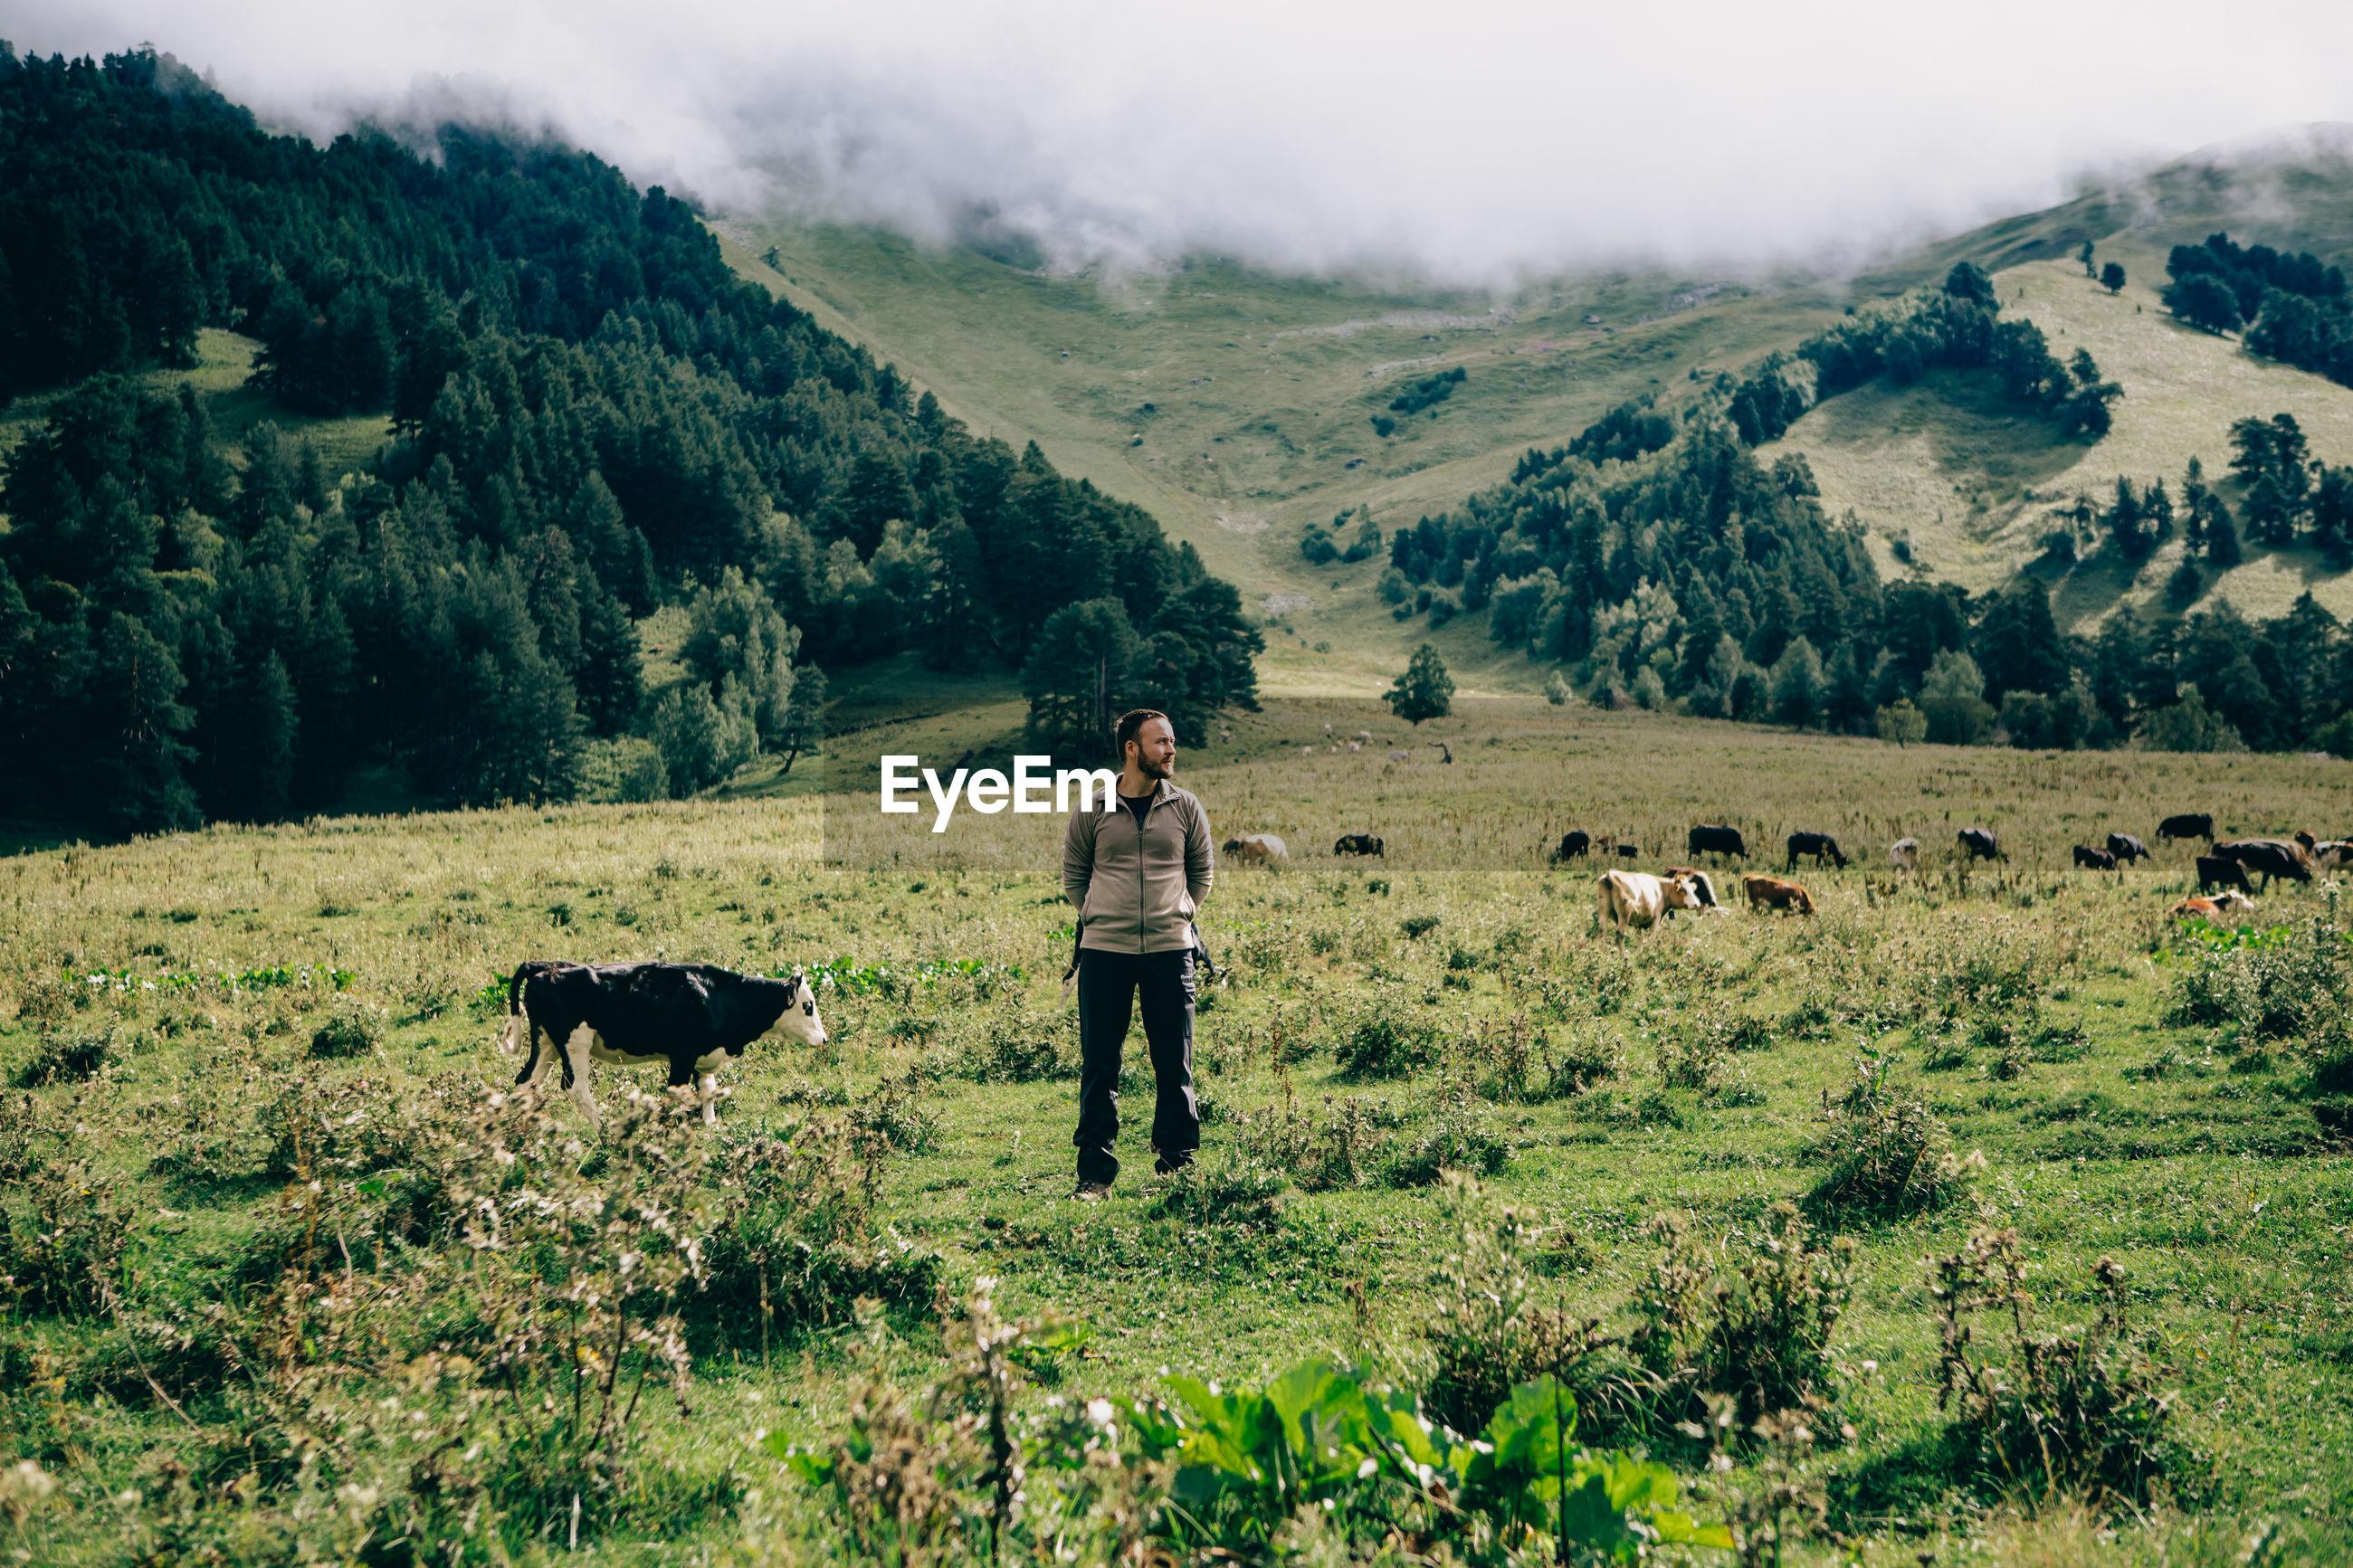 Man standing on grassy mountain